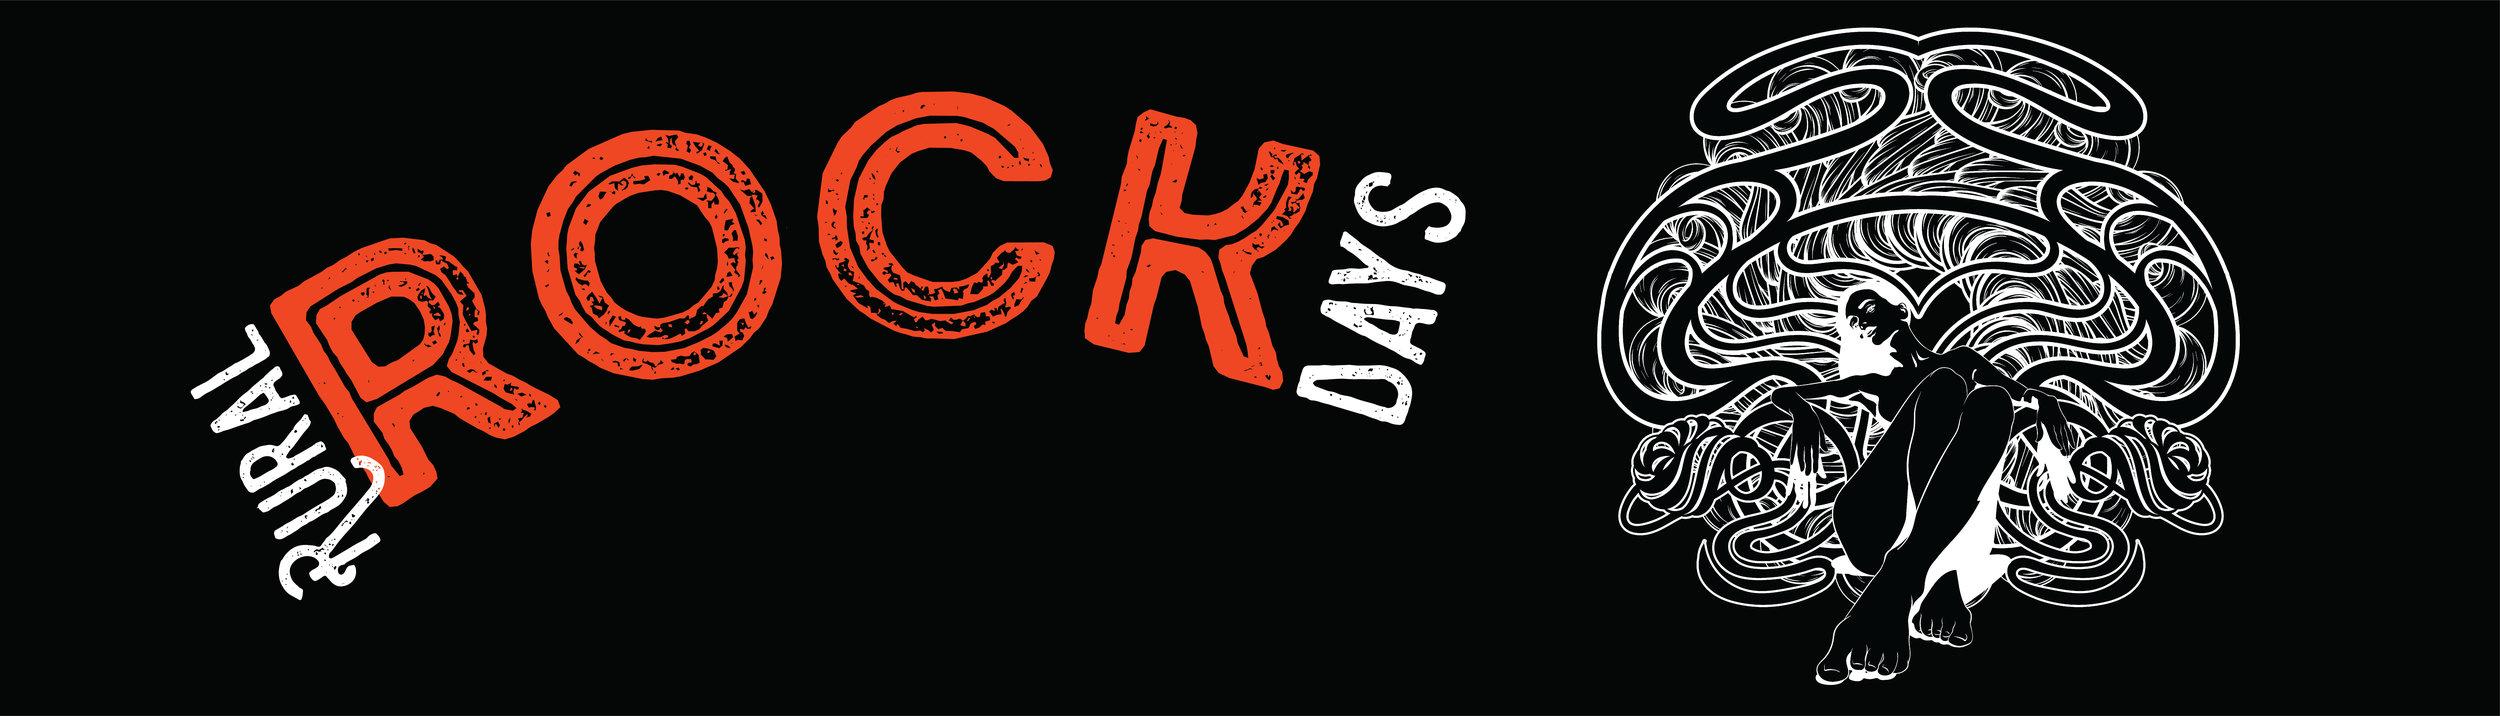 RURAL ROCK DAYS_art-01.jpg